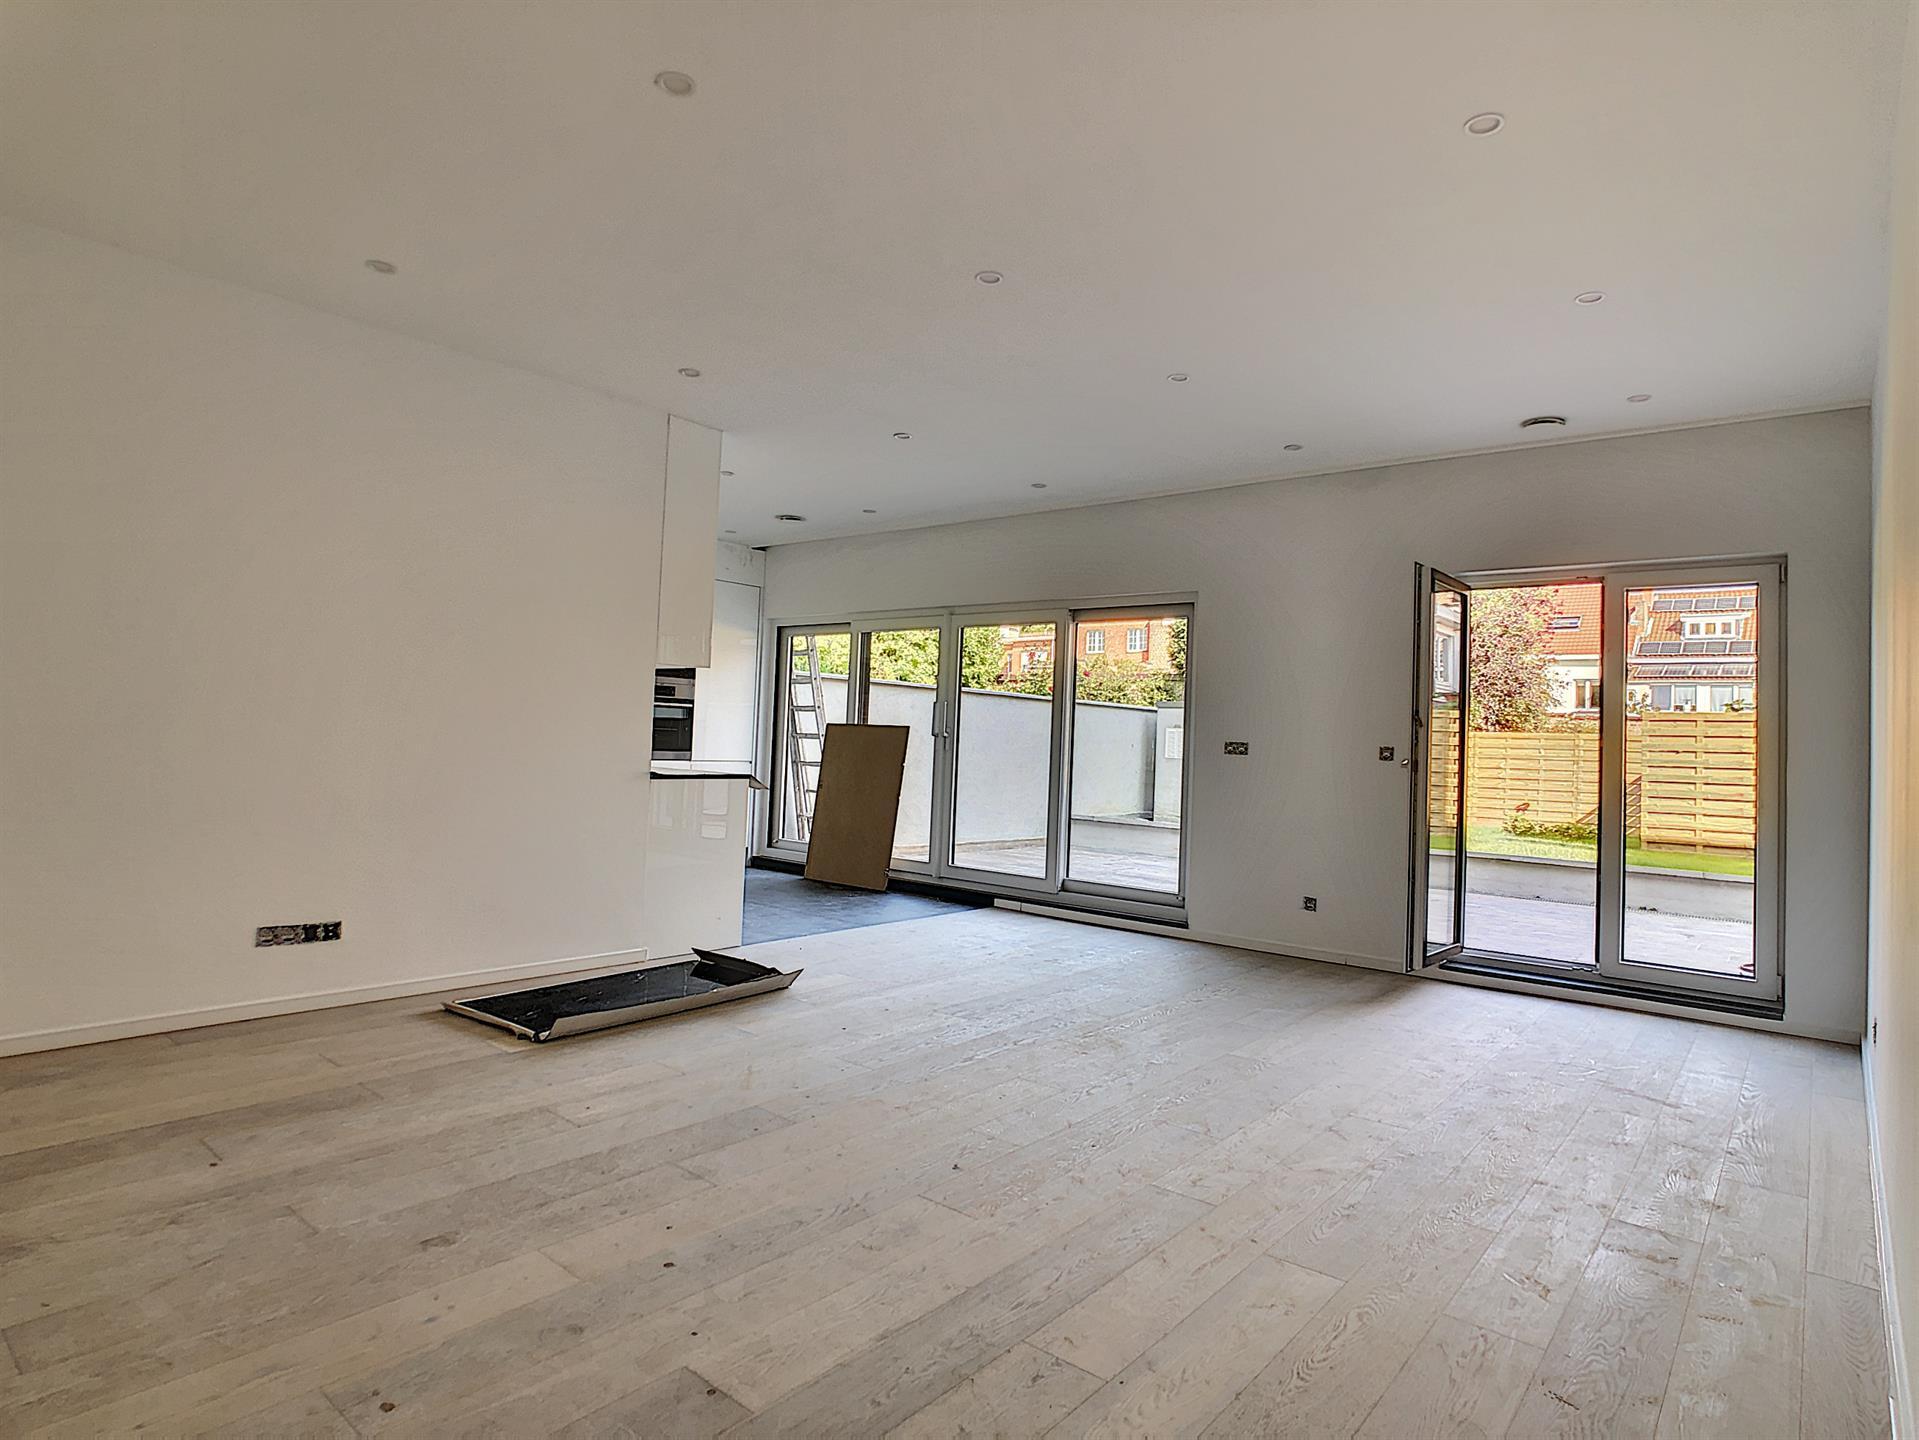 Appartement - Anderlecht - #4252376-17